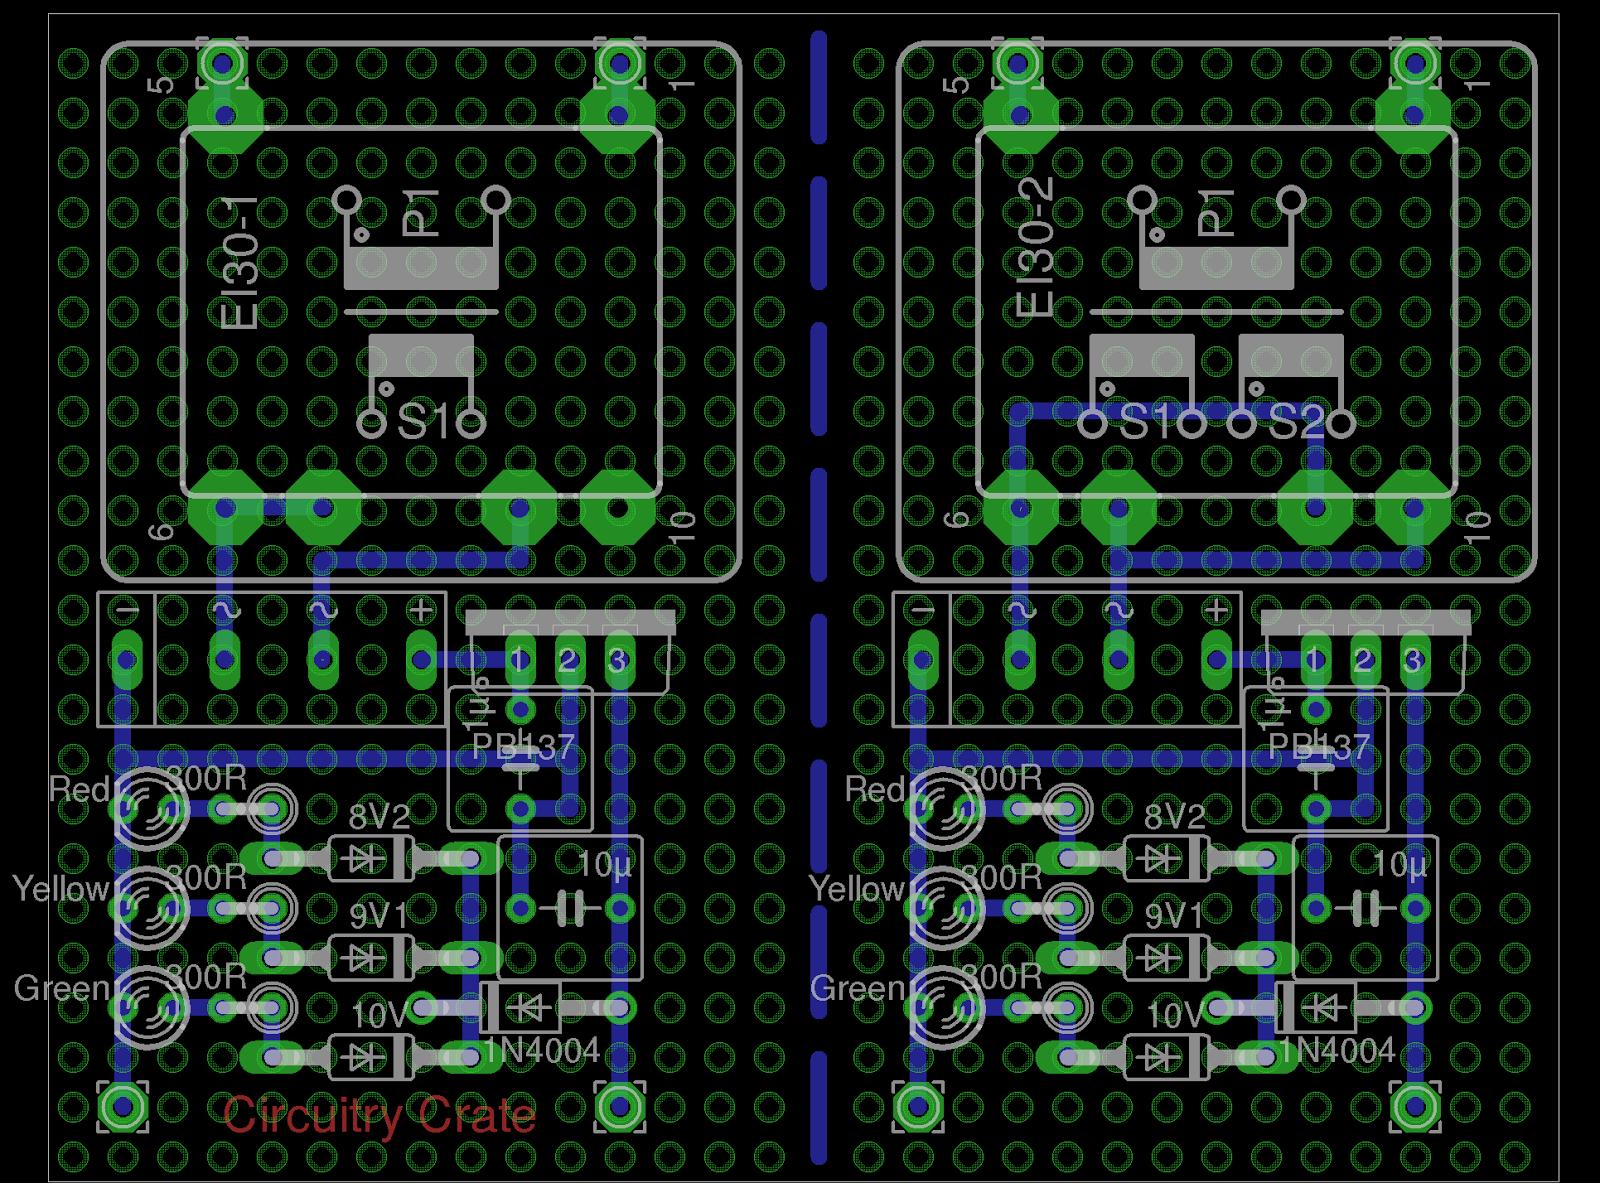 circuitry crate 1 kiss lead acid battery charger with pb317Very Simple Lead Acid Battery Charger With Pb137 Regulator #21